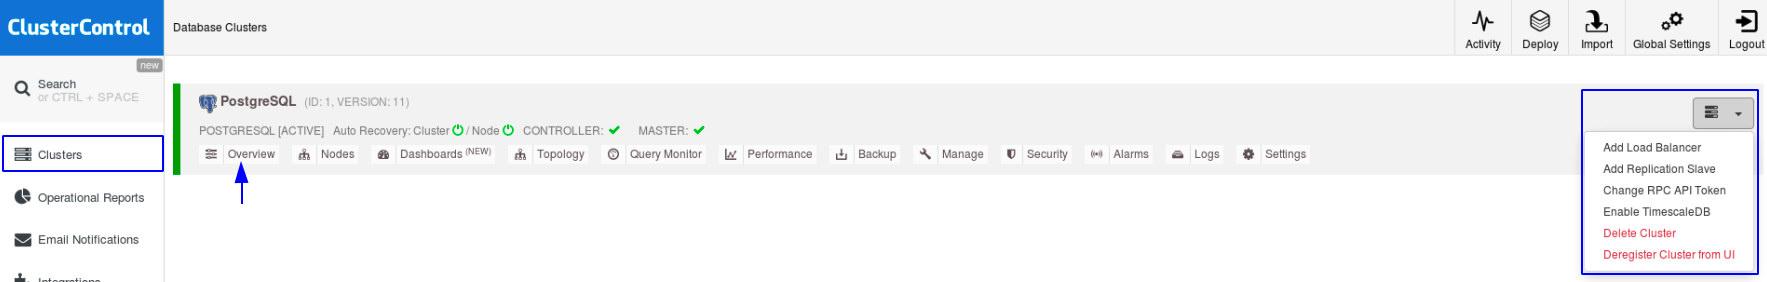 PostgreSQL Cluster imported successfully